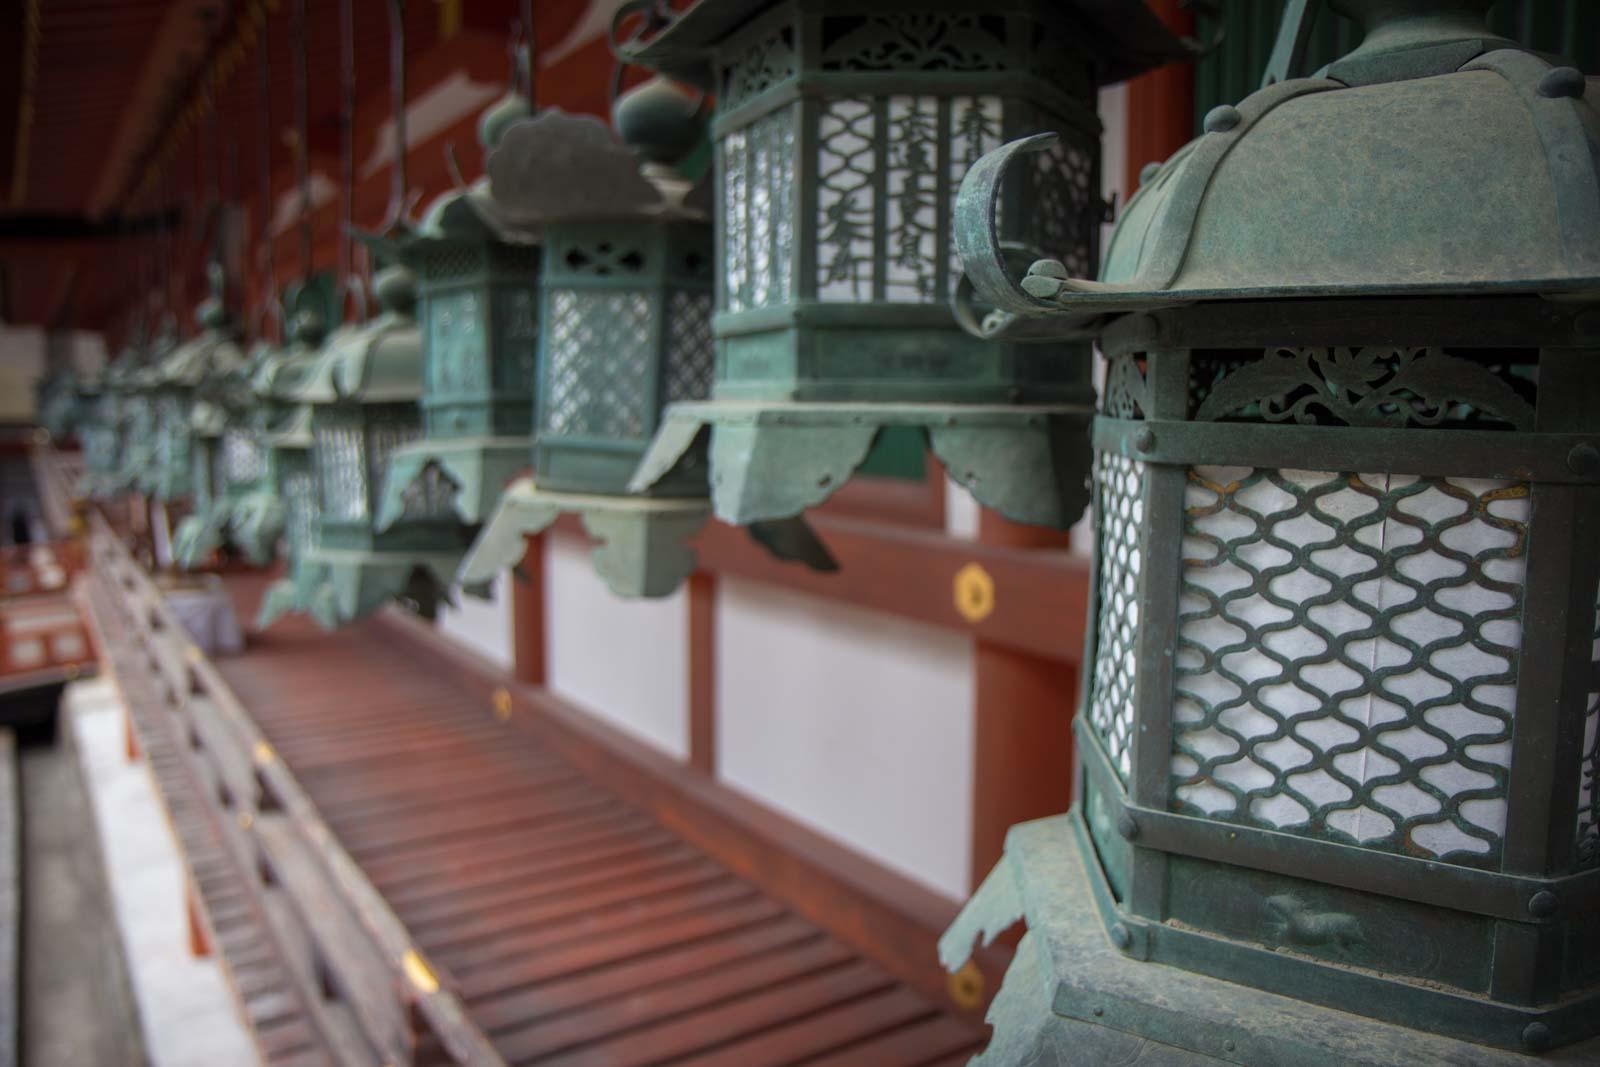 Nara World Heritage temples and shrines, Kyoto, Japan